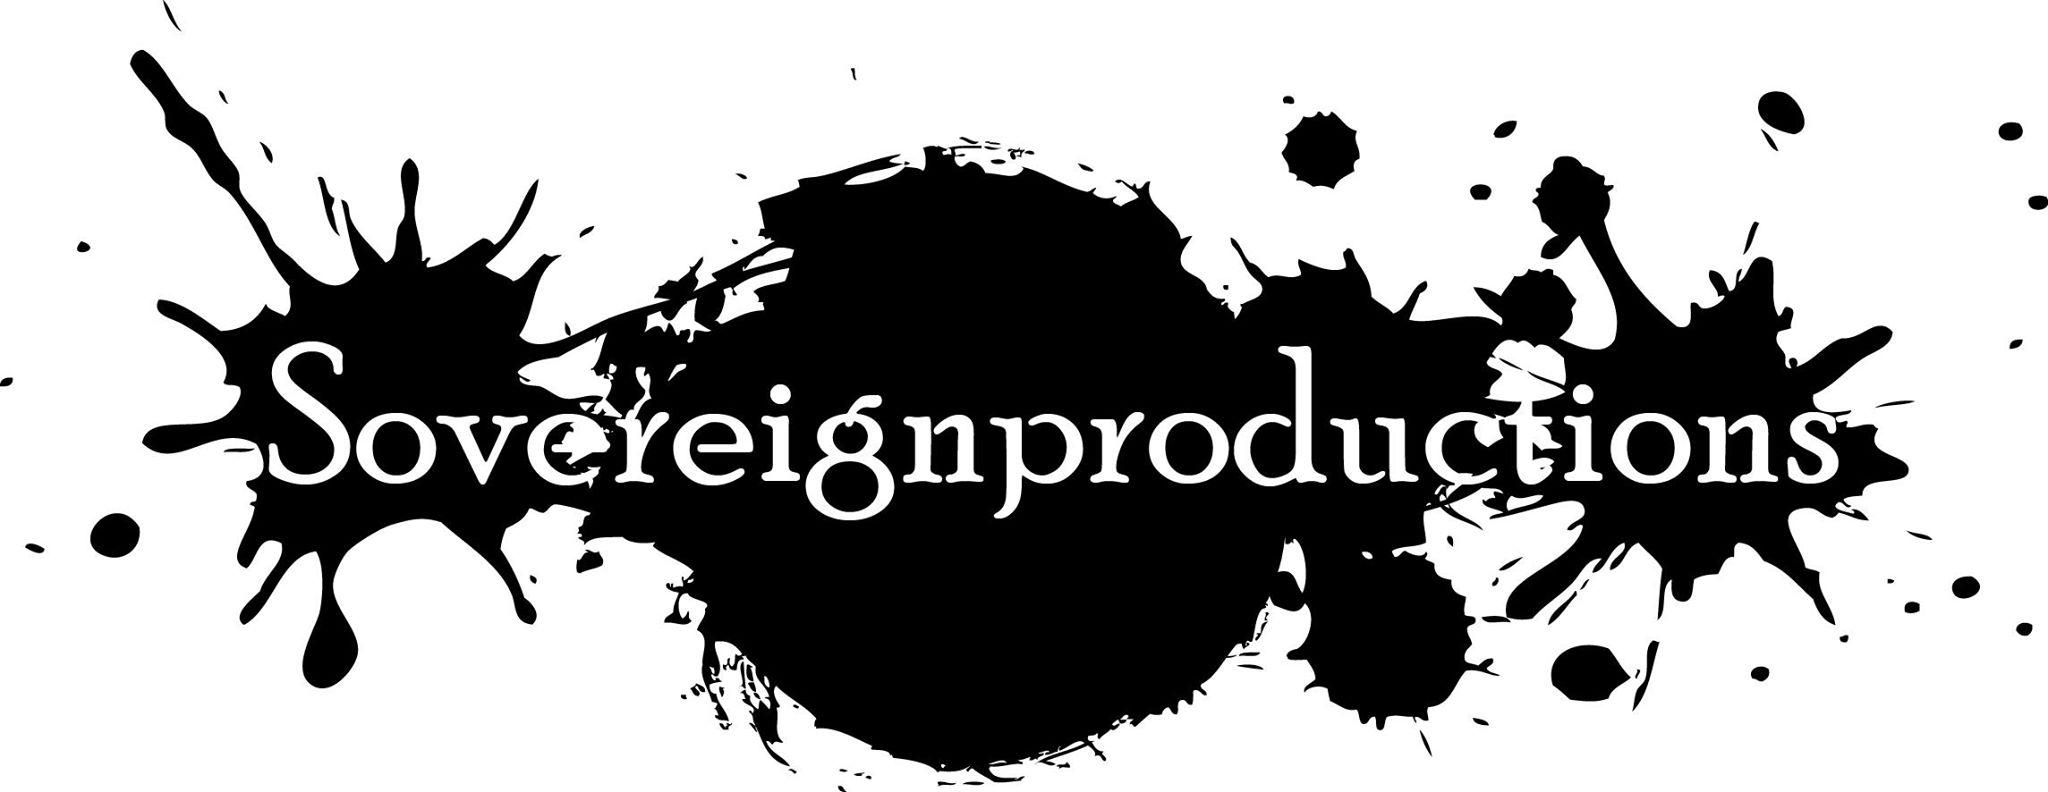 sovereignproductions_logo.jpg